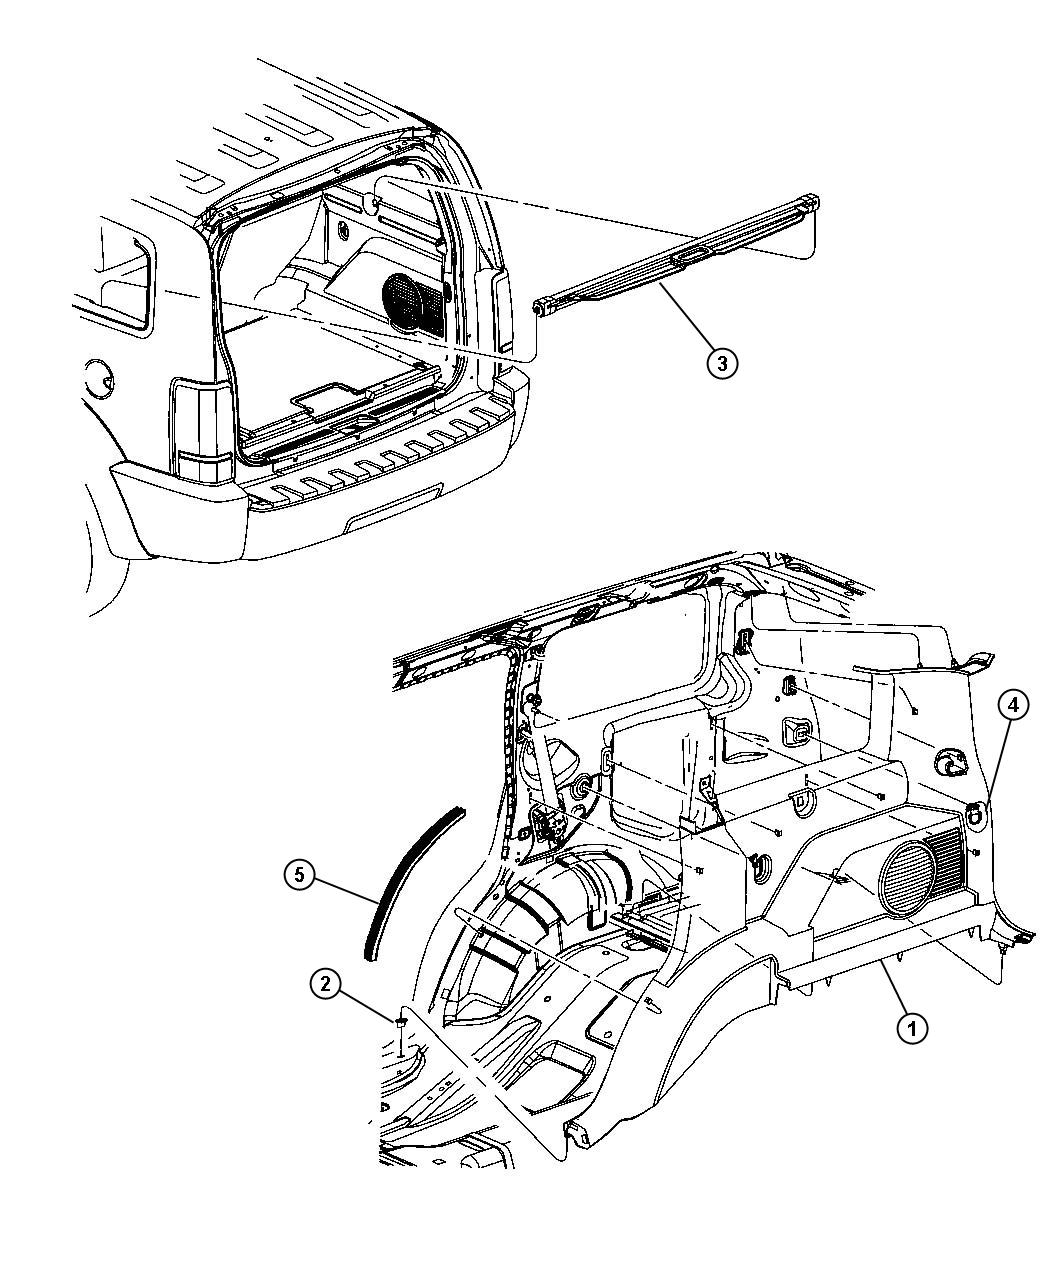 Jeep Liberty Panel Quarter Trim Da Da Without 8